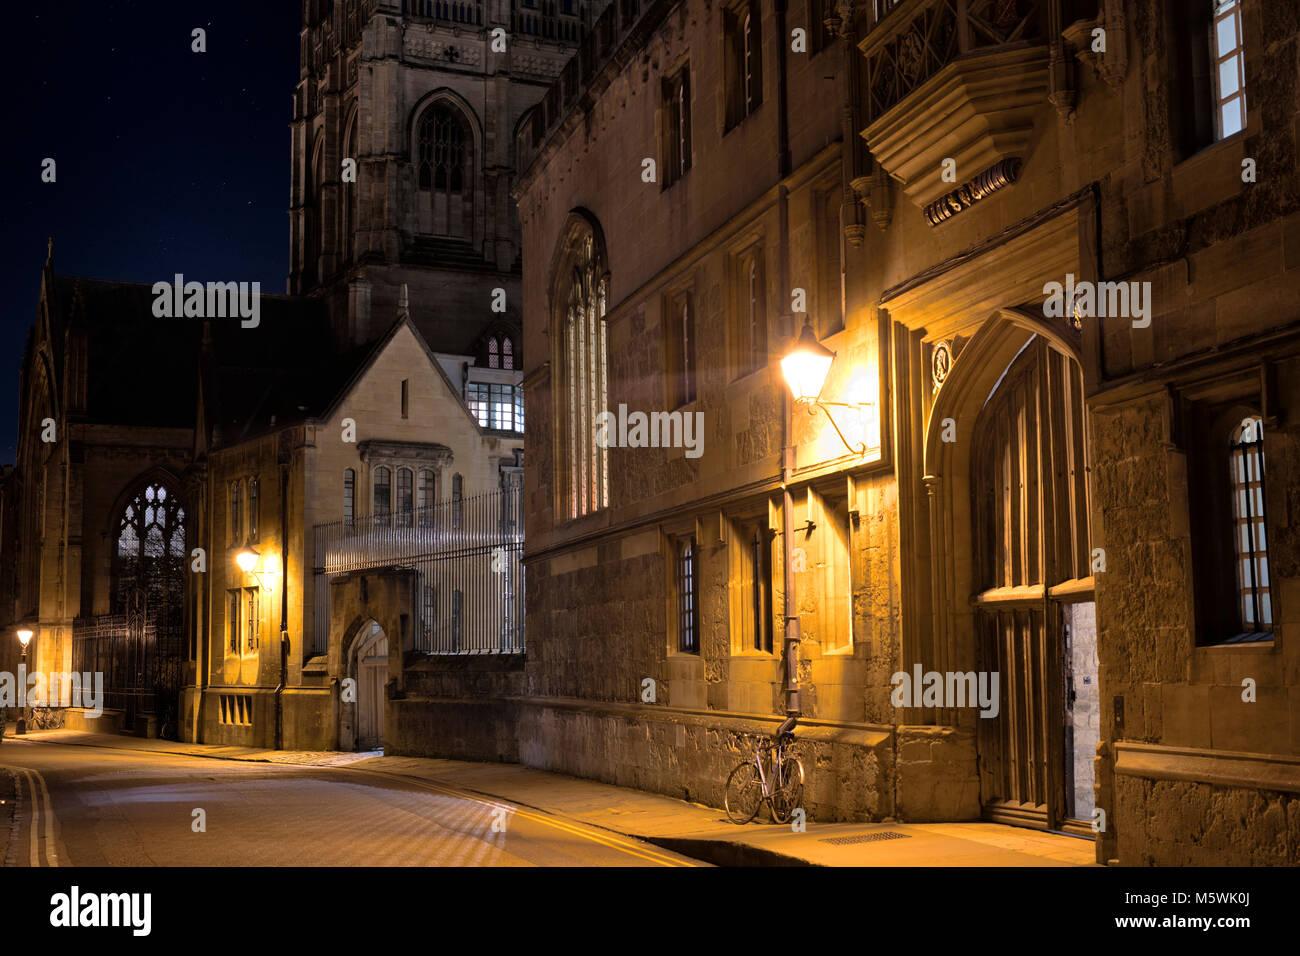 Corpus Christi college in Merton street at night. Oxford, Oxfordshire, England - Stock Image